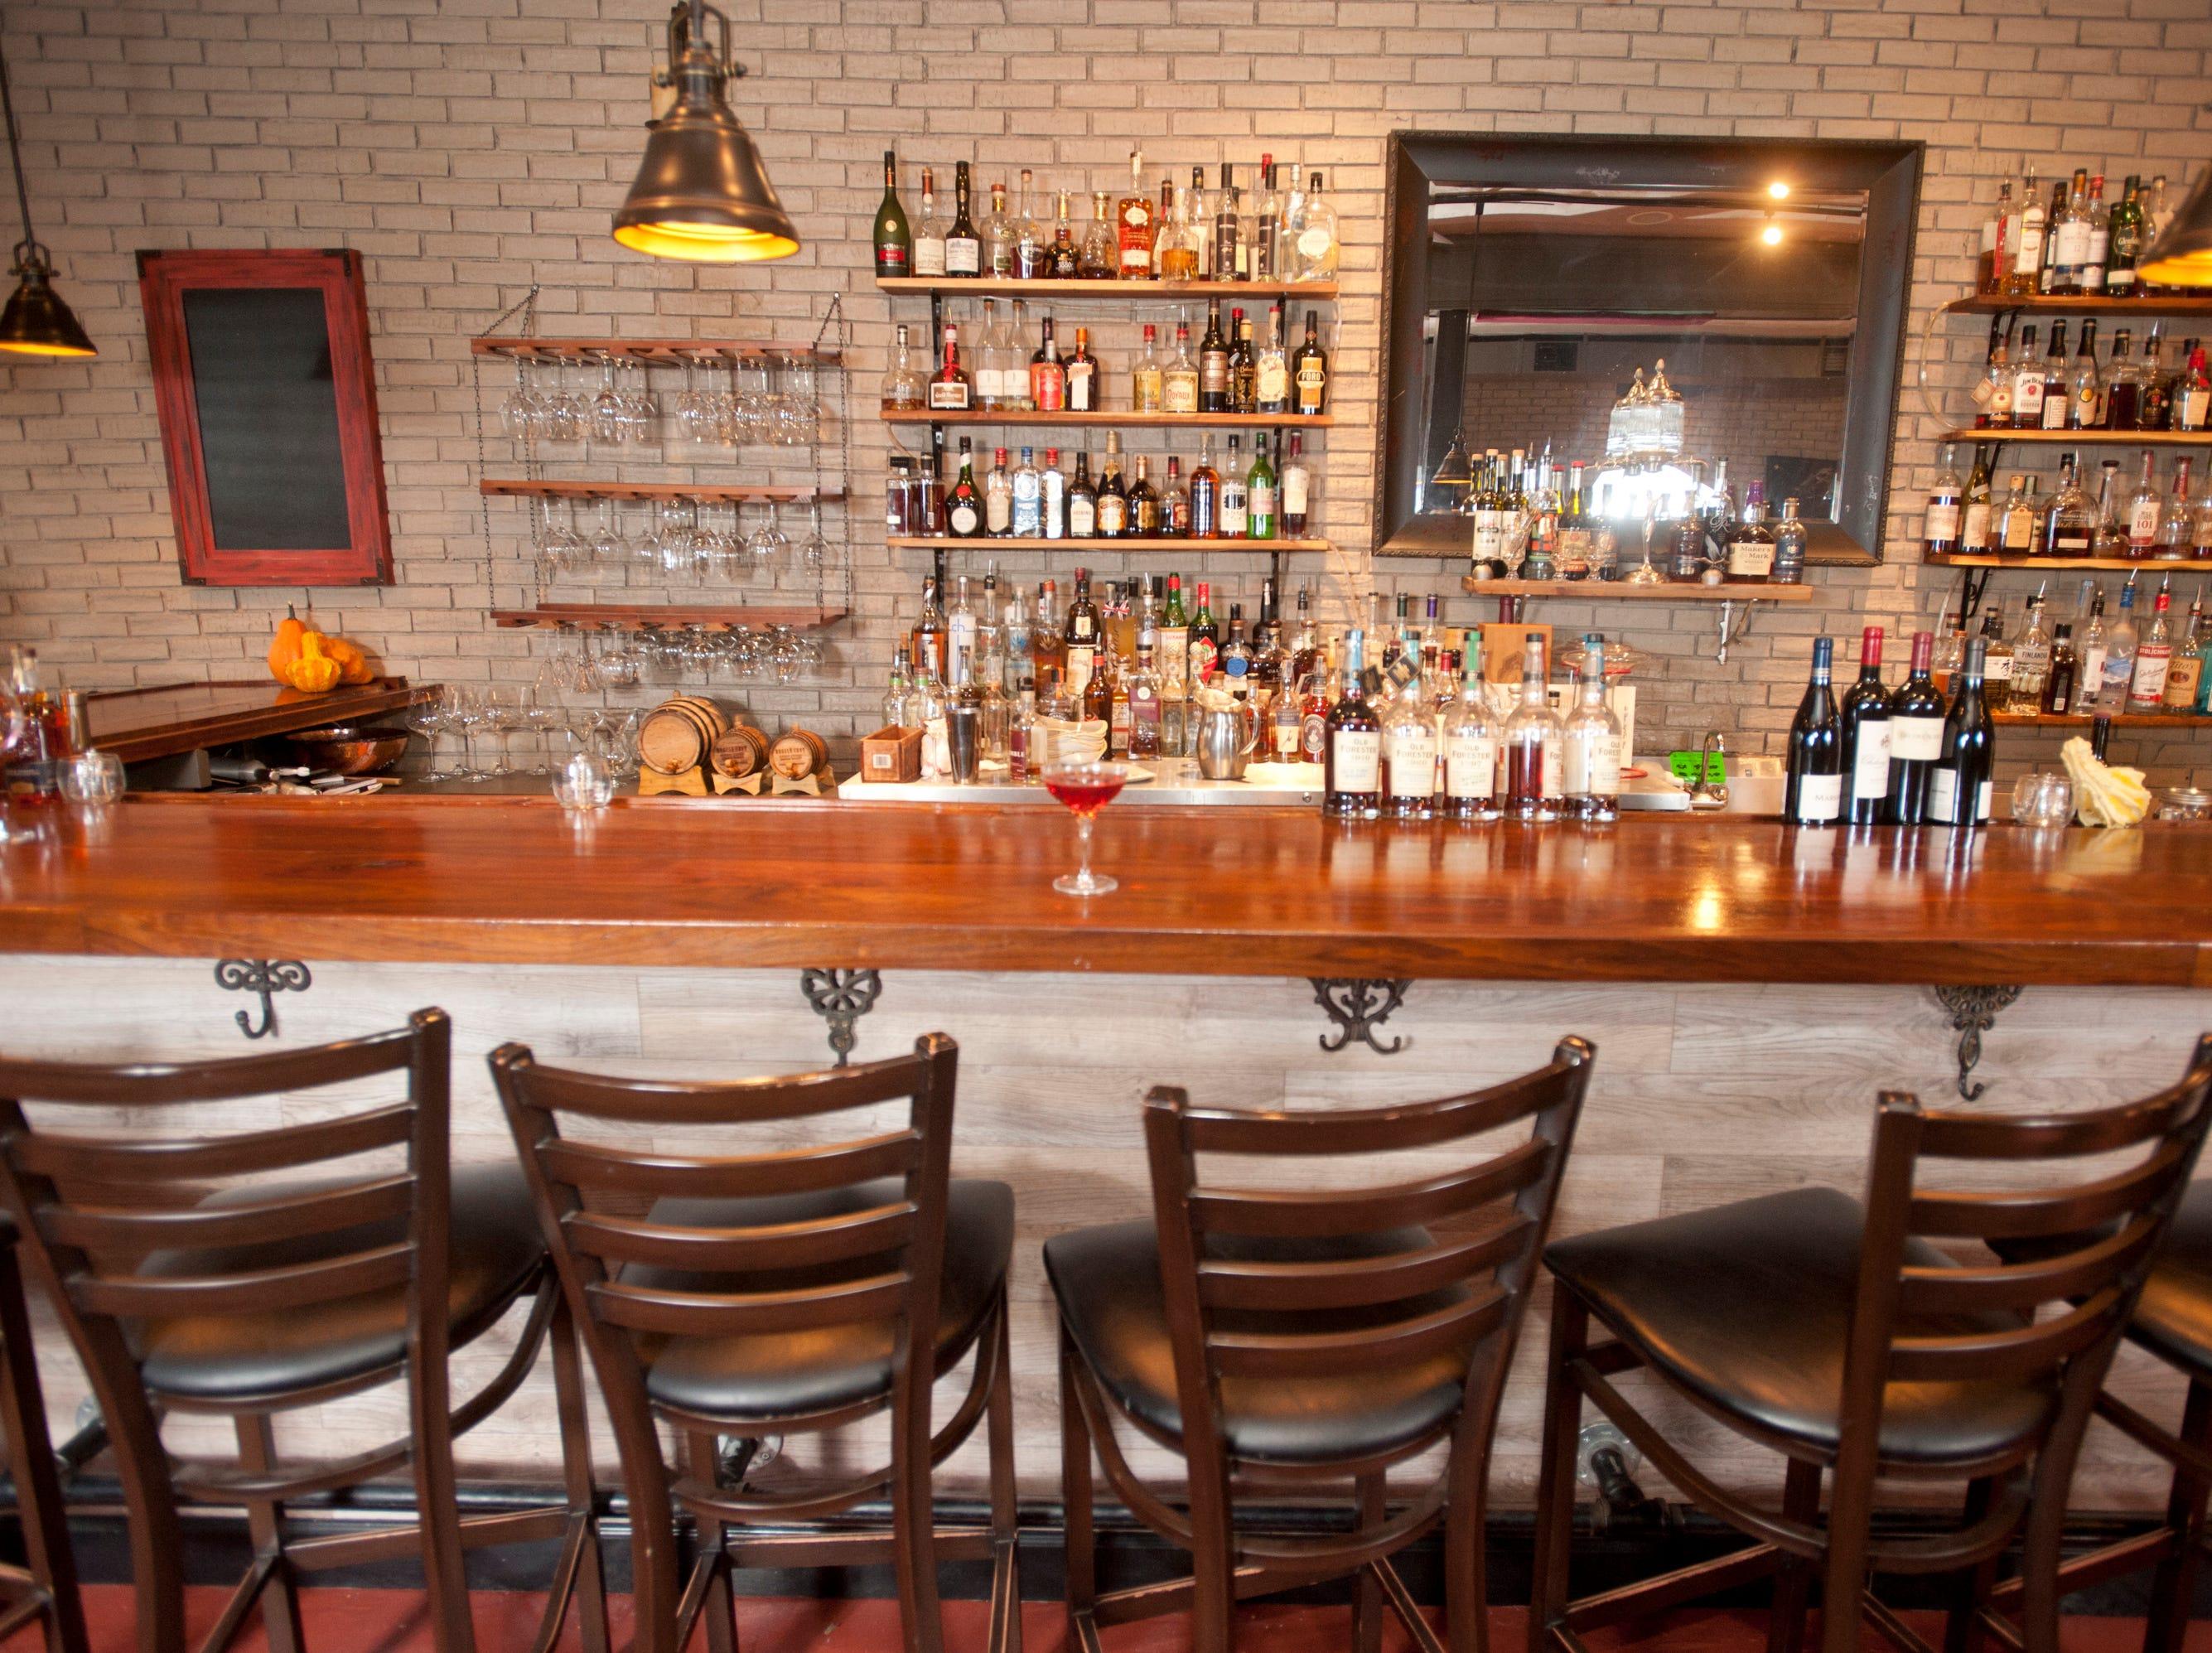 The bar at La Chasse Restaurant on Bardstown Road.November 15, 2018